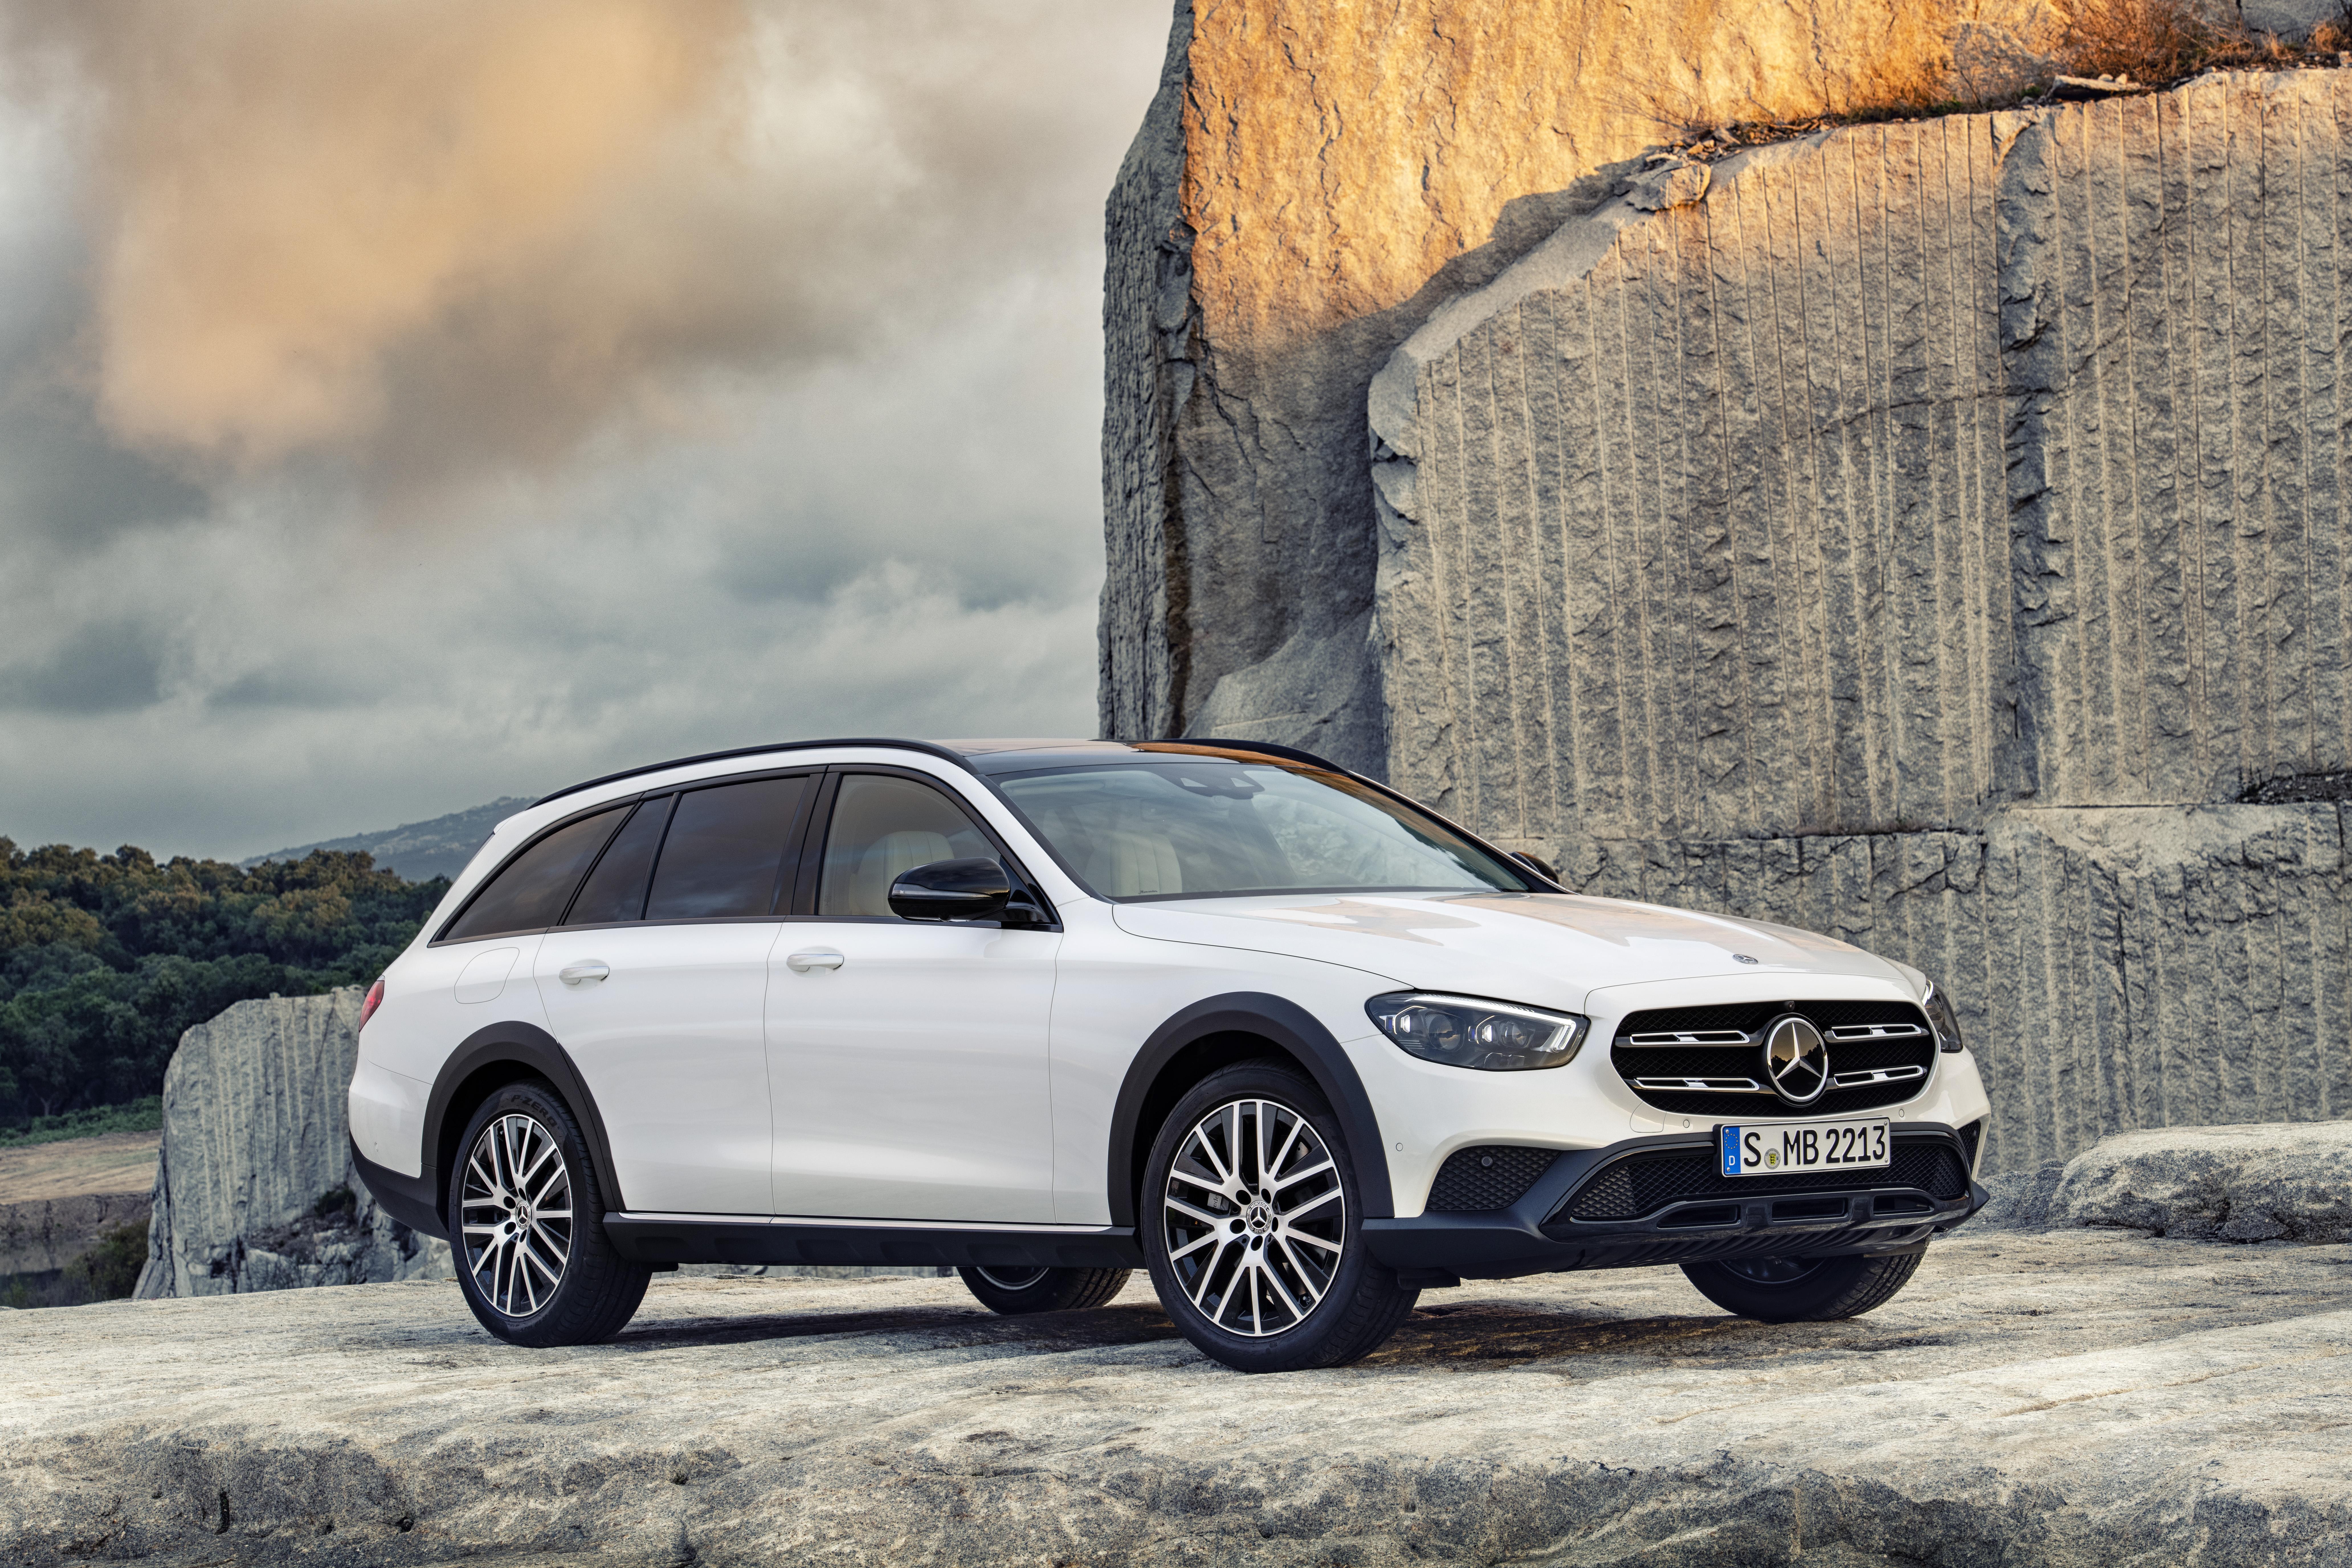 Mercedes-Benz E-Klasse All-Terrain, 2020Mercedes-Benz E-Class All-Terrain, 2020